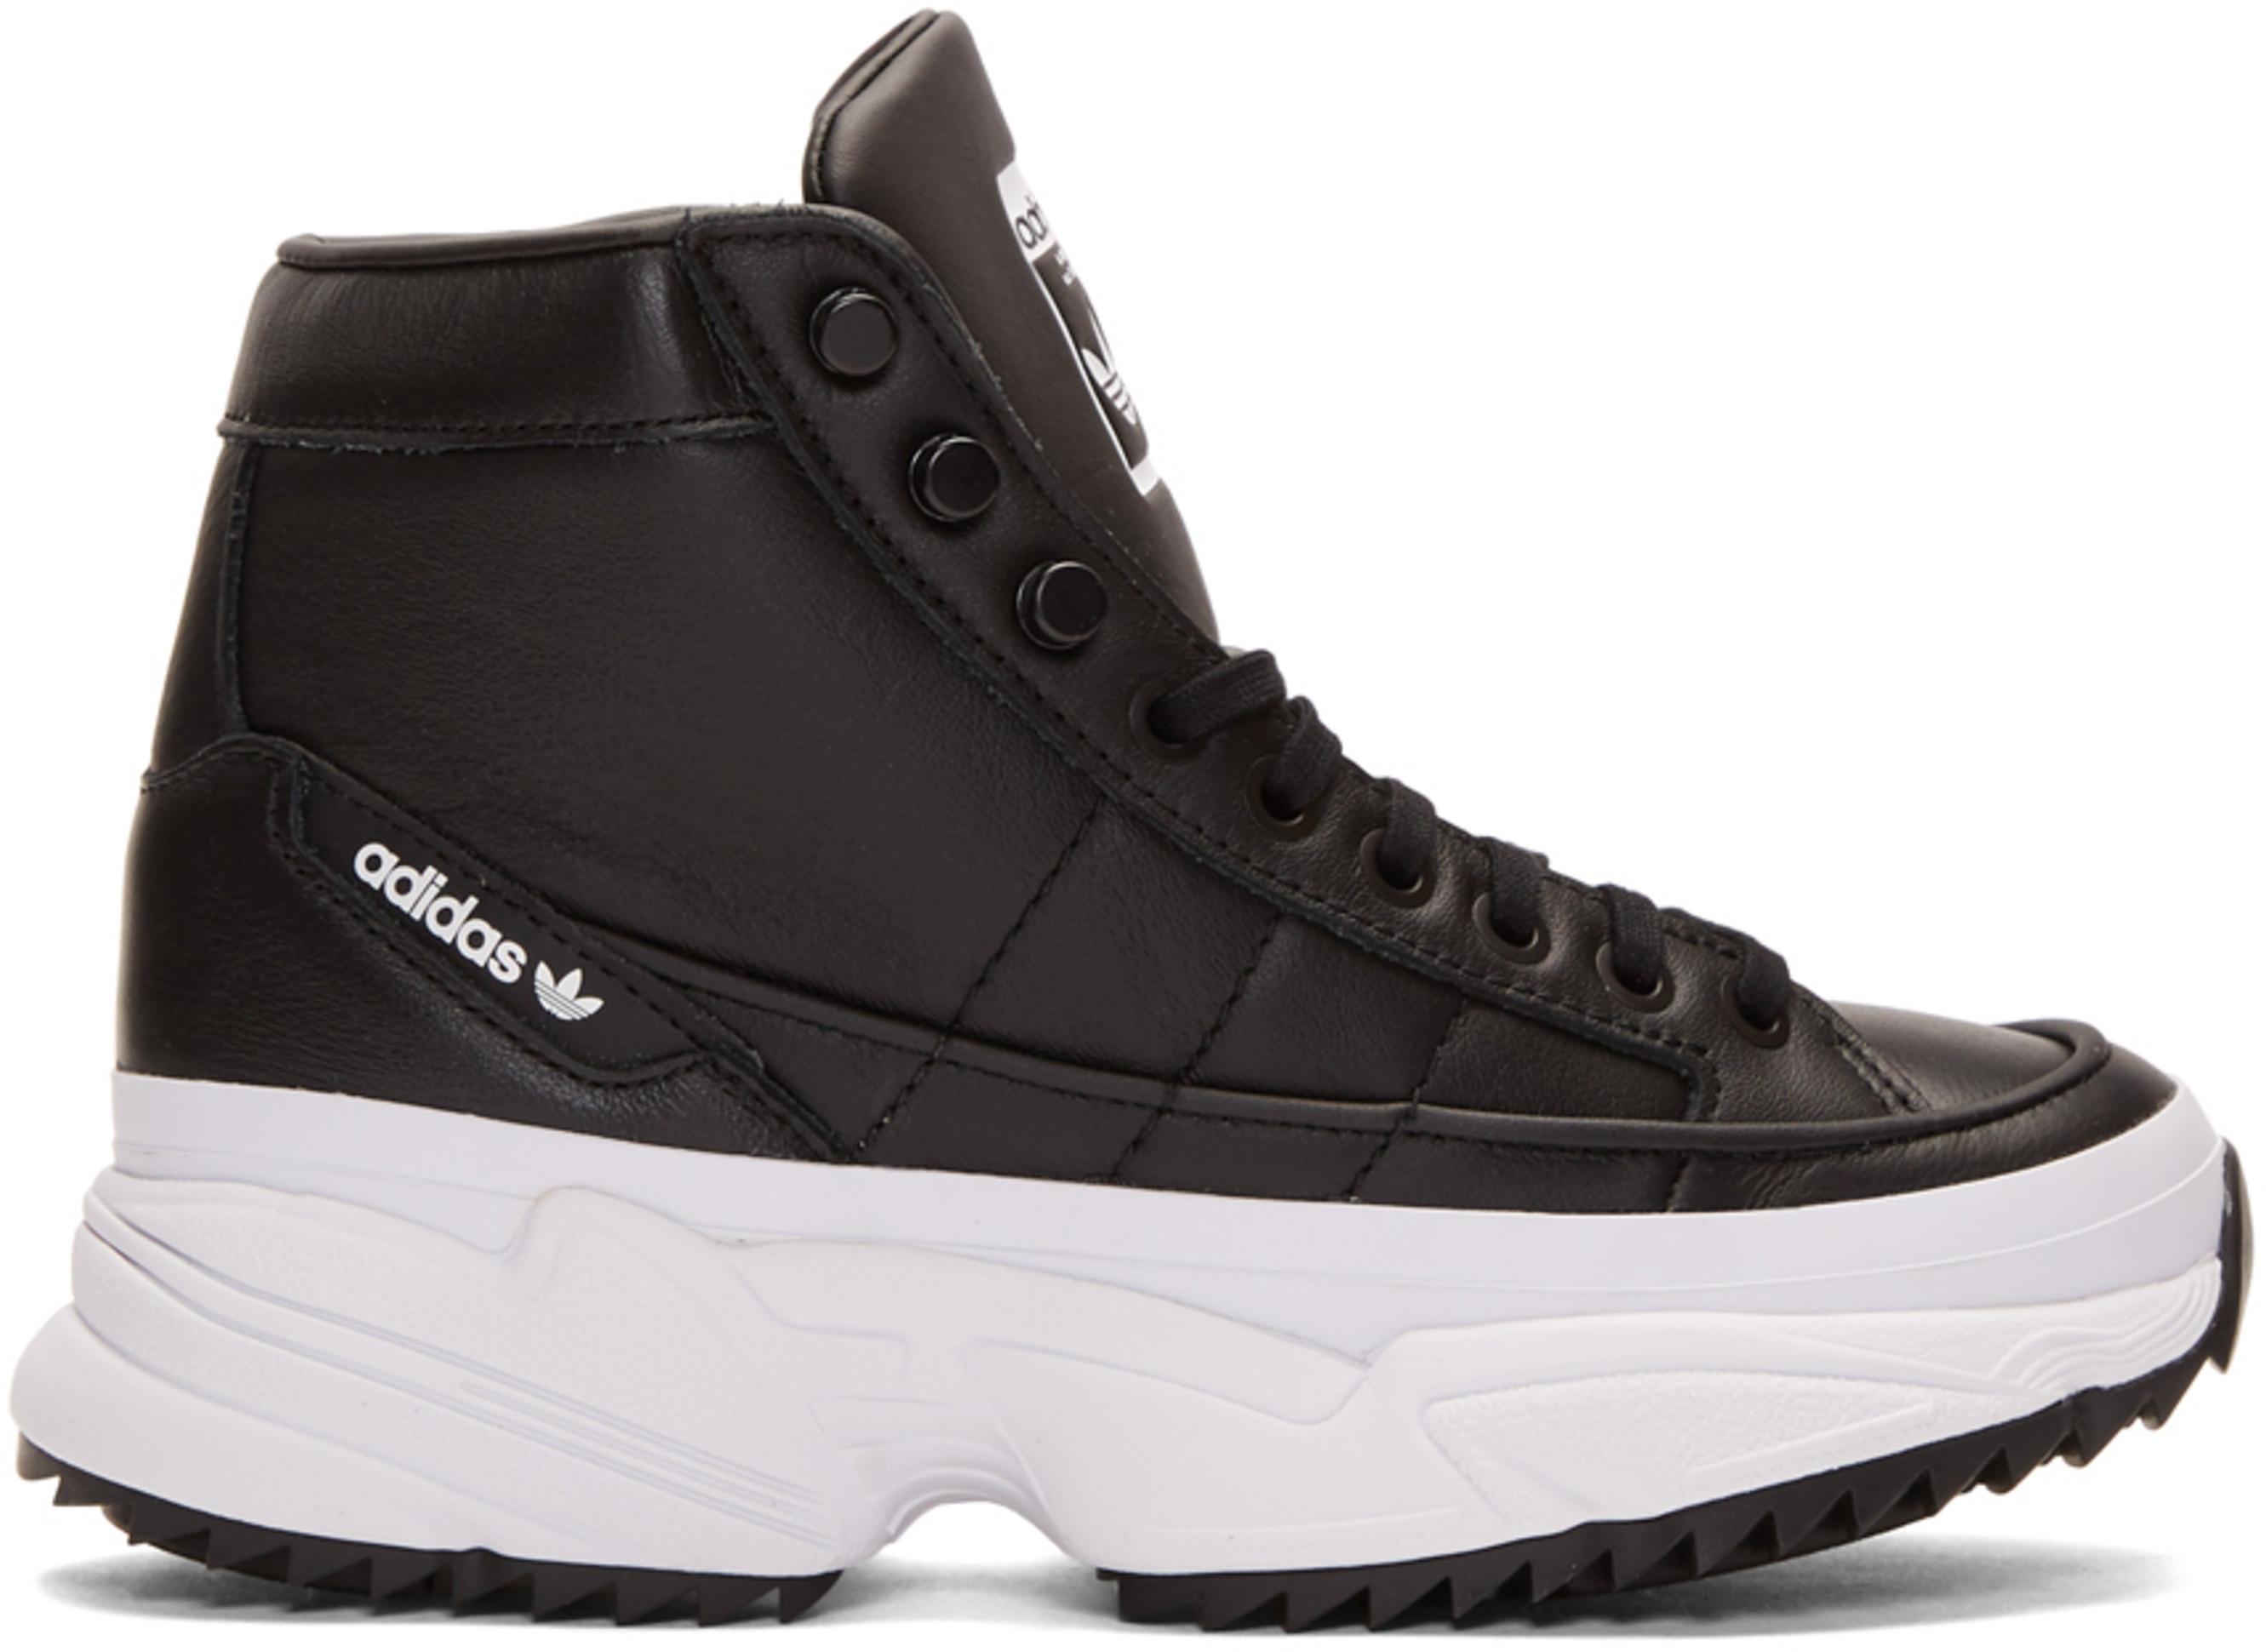 Black Kiellor Xtra Sneakers